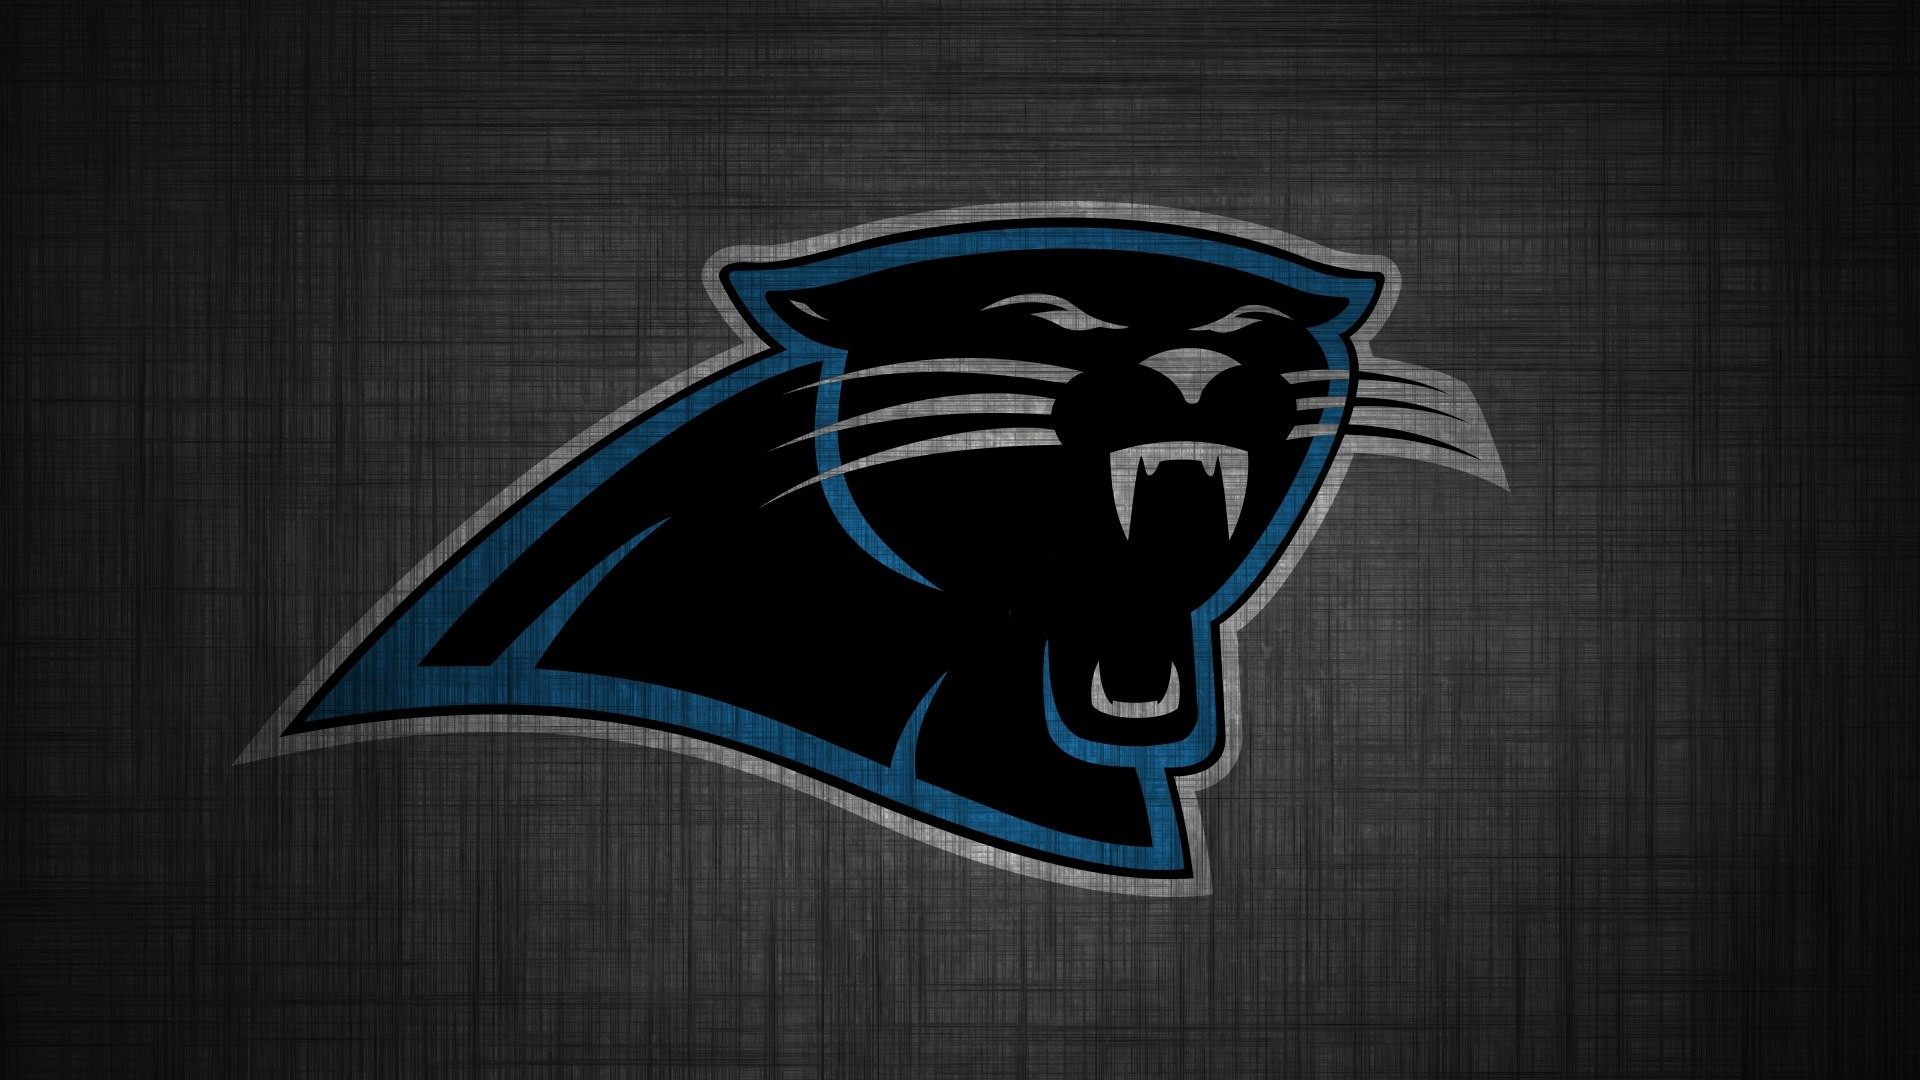 6 HD Carolina Panthers Wallpapers